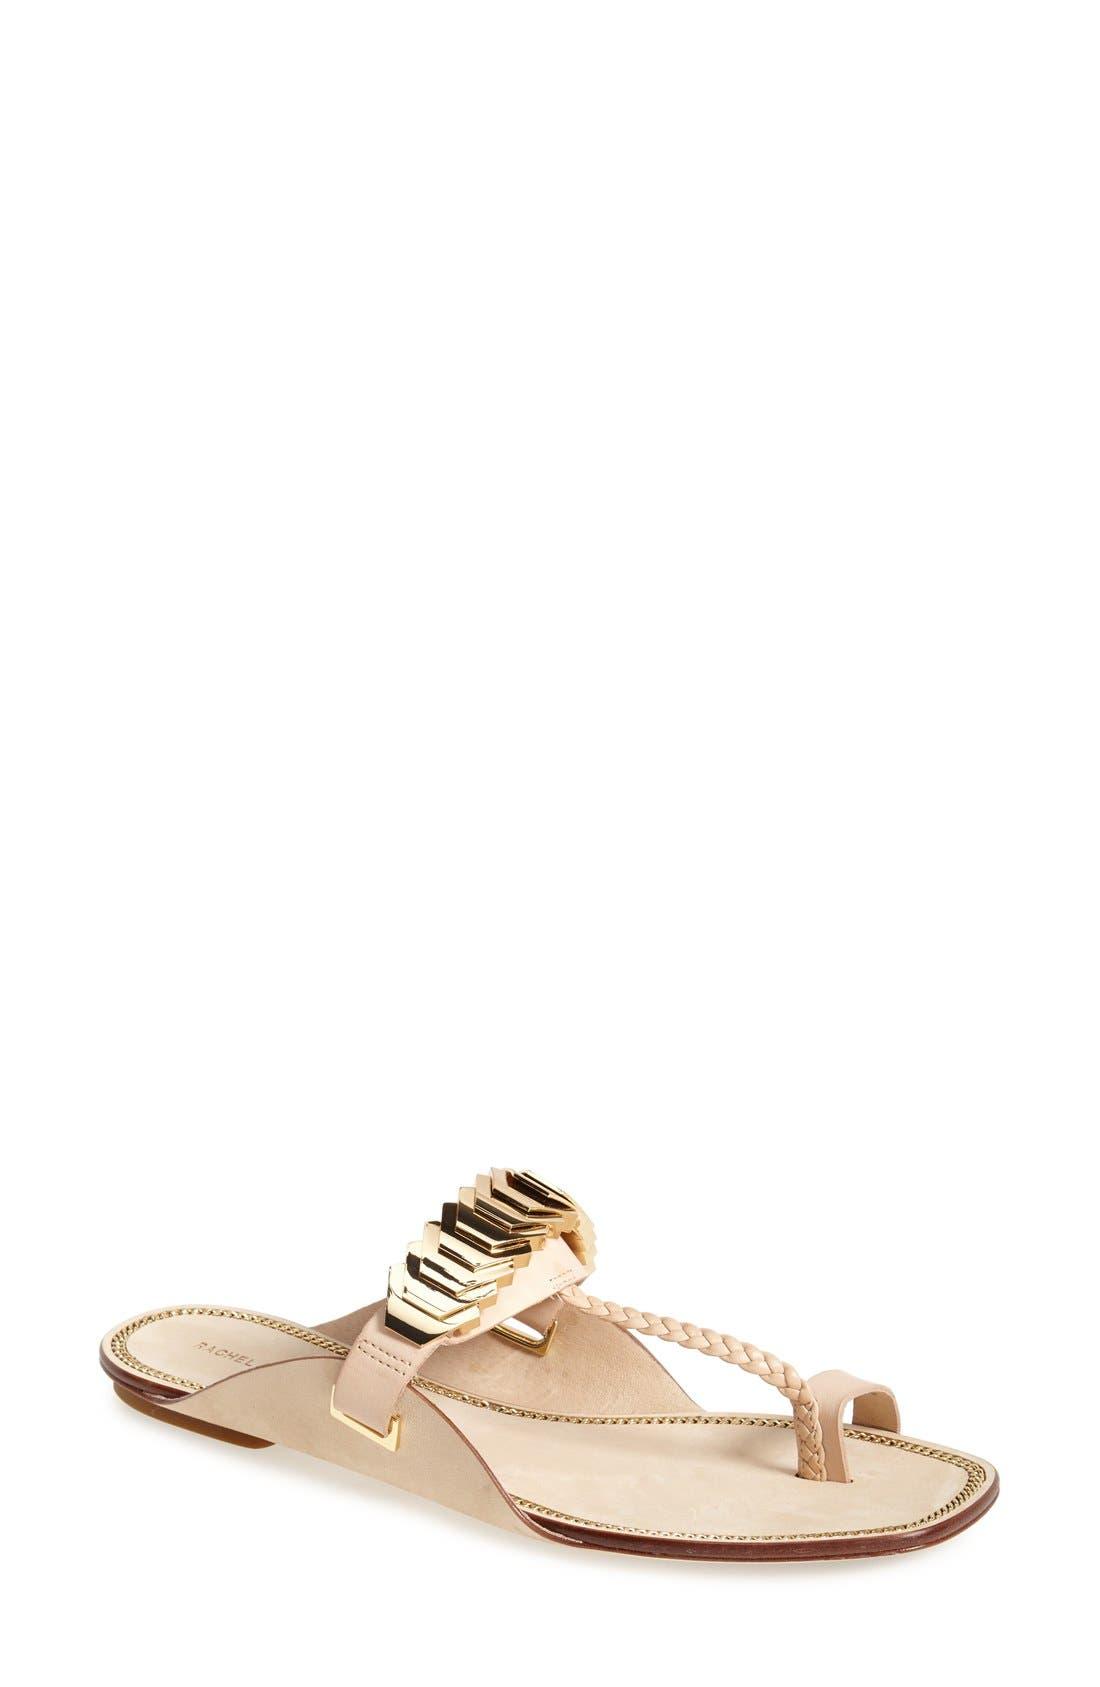 Main Image - Rachel Zoe 'Ida' Leather Toe Loop Sandal (Women)